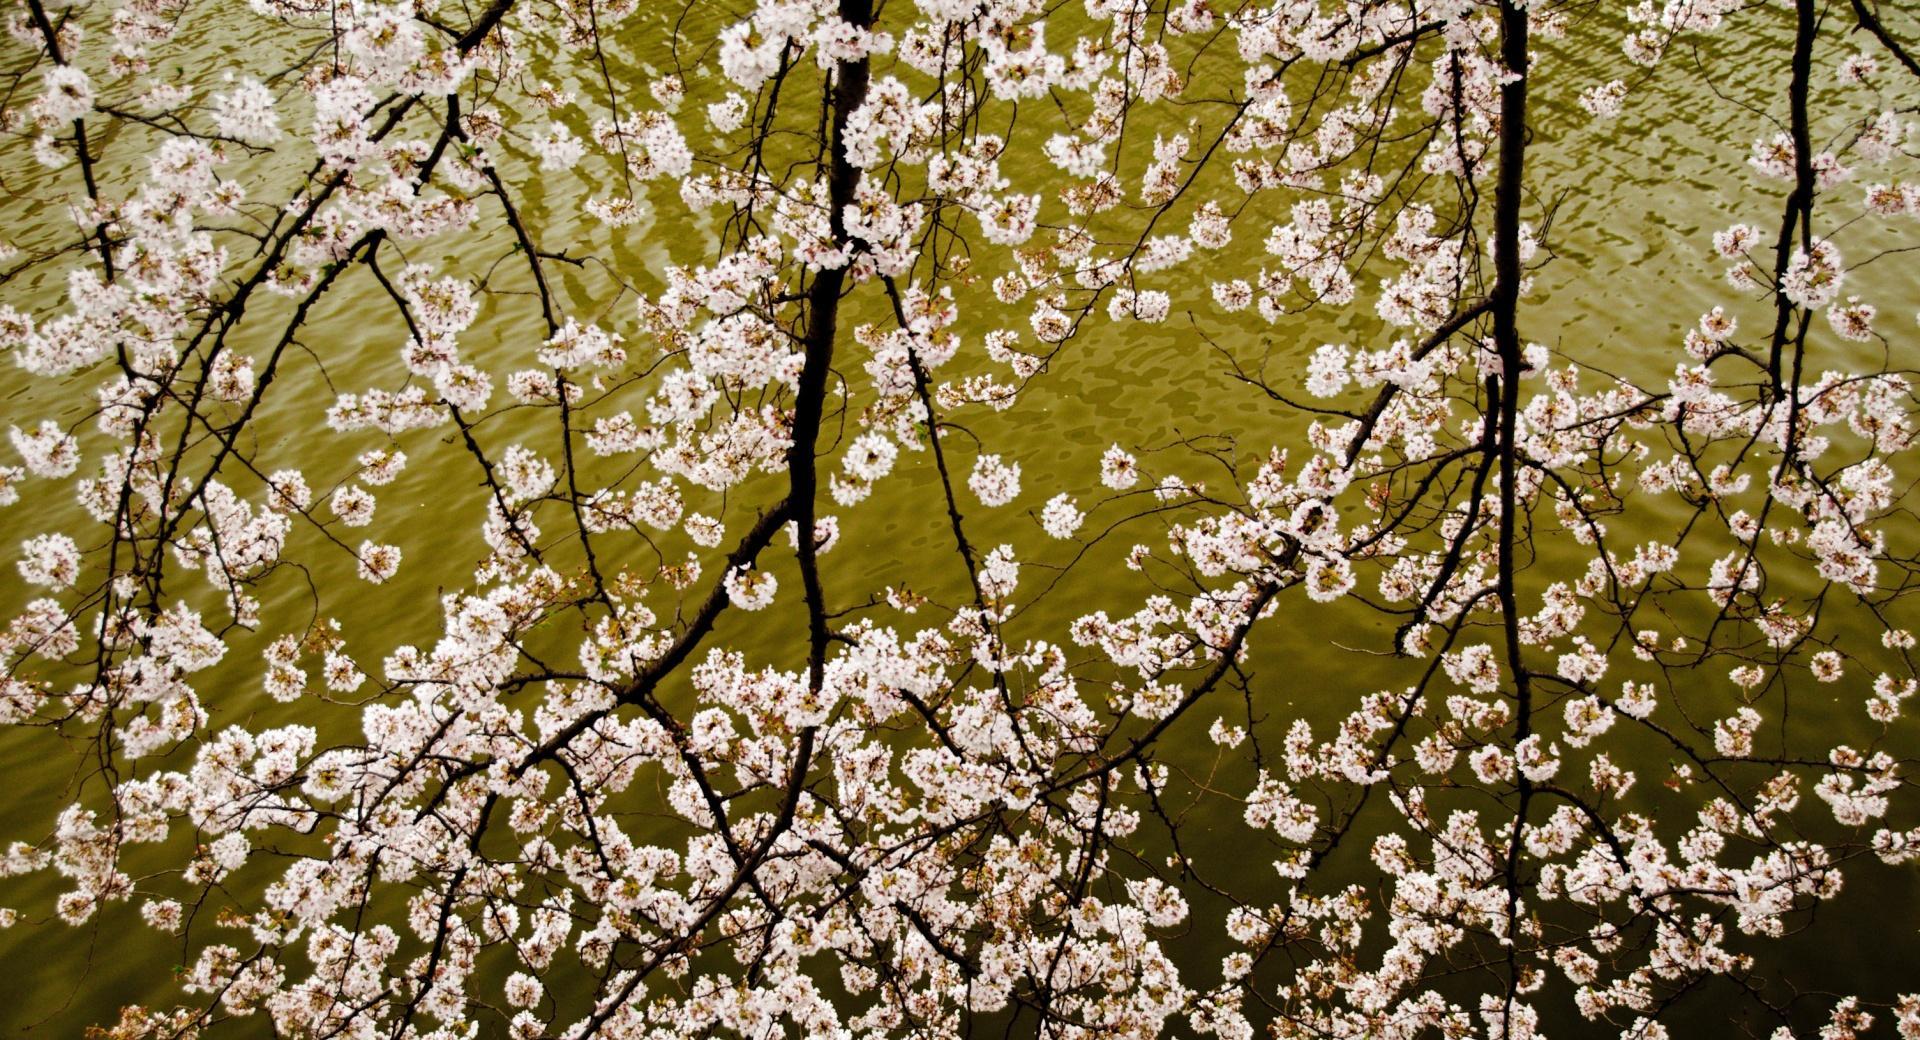 Sakura Branches wallpapers HD quality